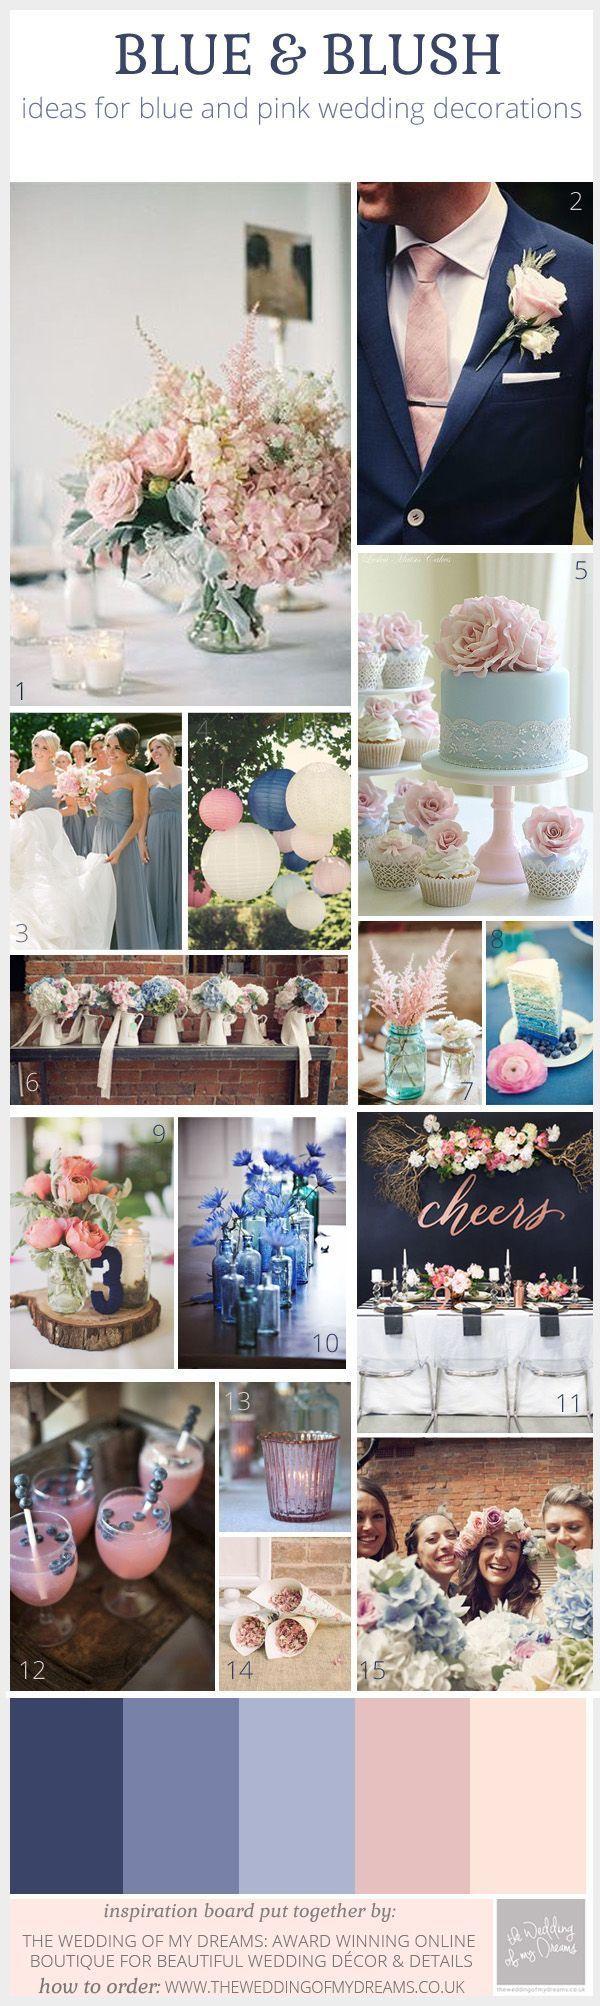 Blue And Blush Pink Wedding Decorations, 2016 wedding colors, blush wedding ideas